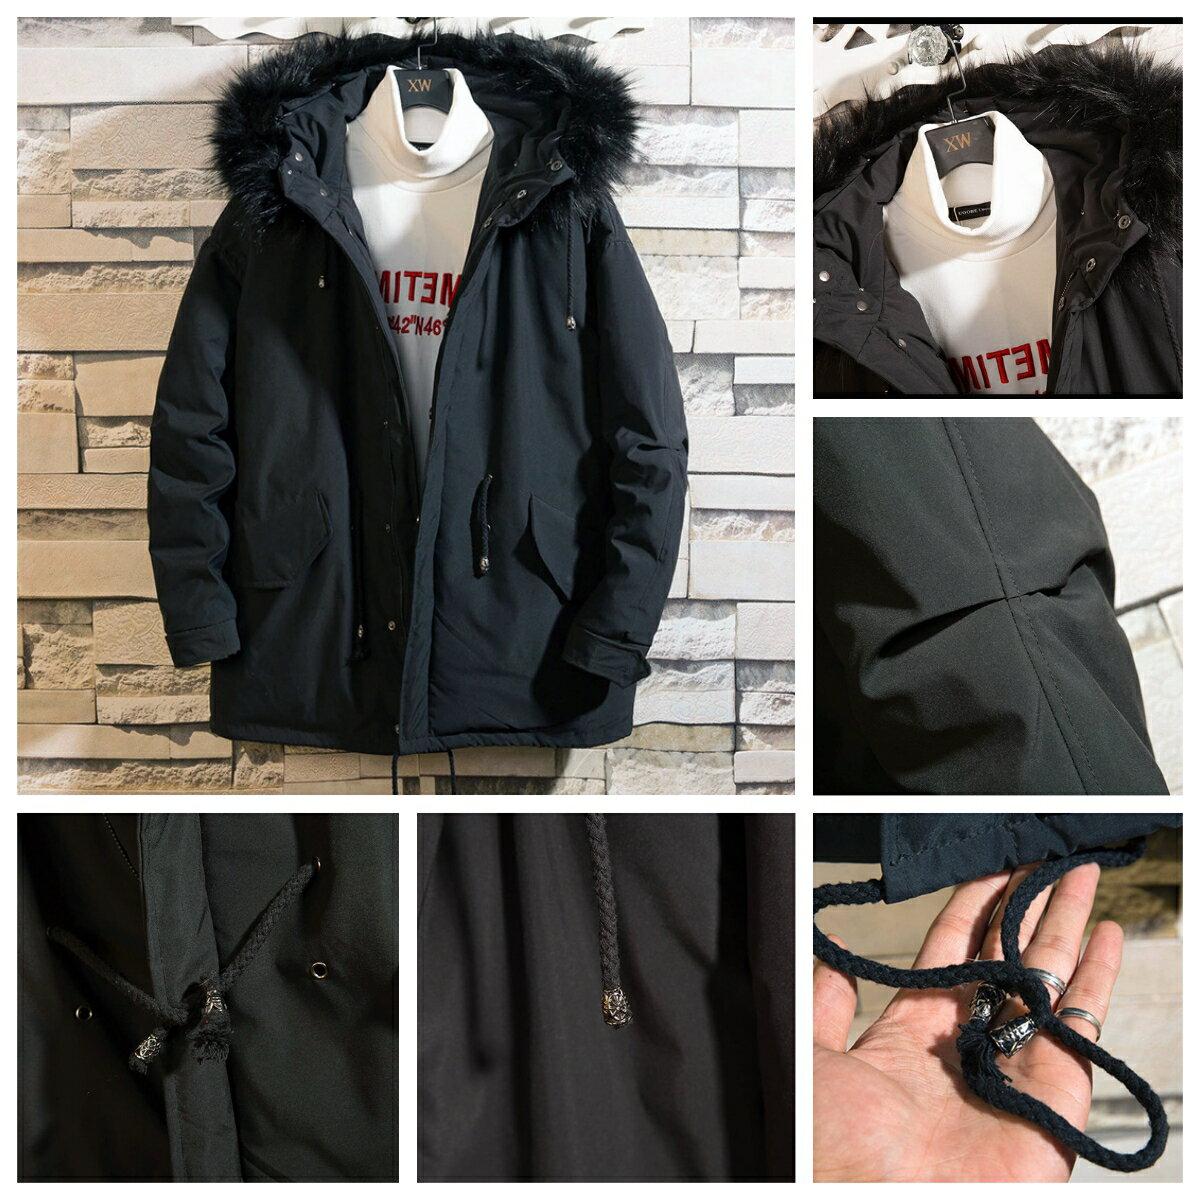 VeroMan メンズ ファー付きモッズミリタリーコート アウター ダウンジャケット 防寒 防風 厚手 アウトドア